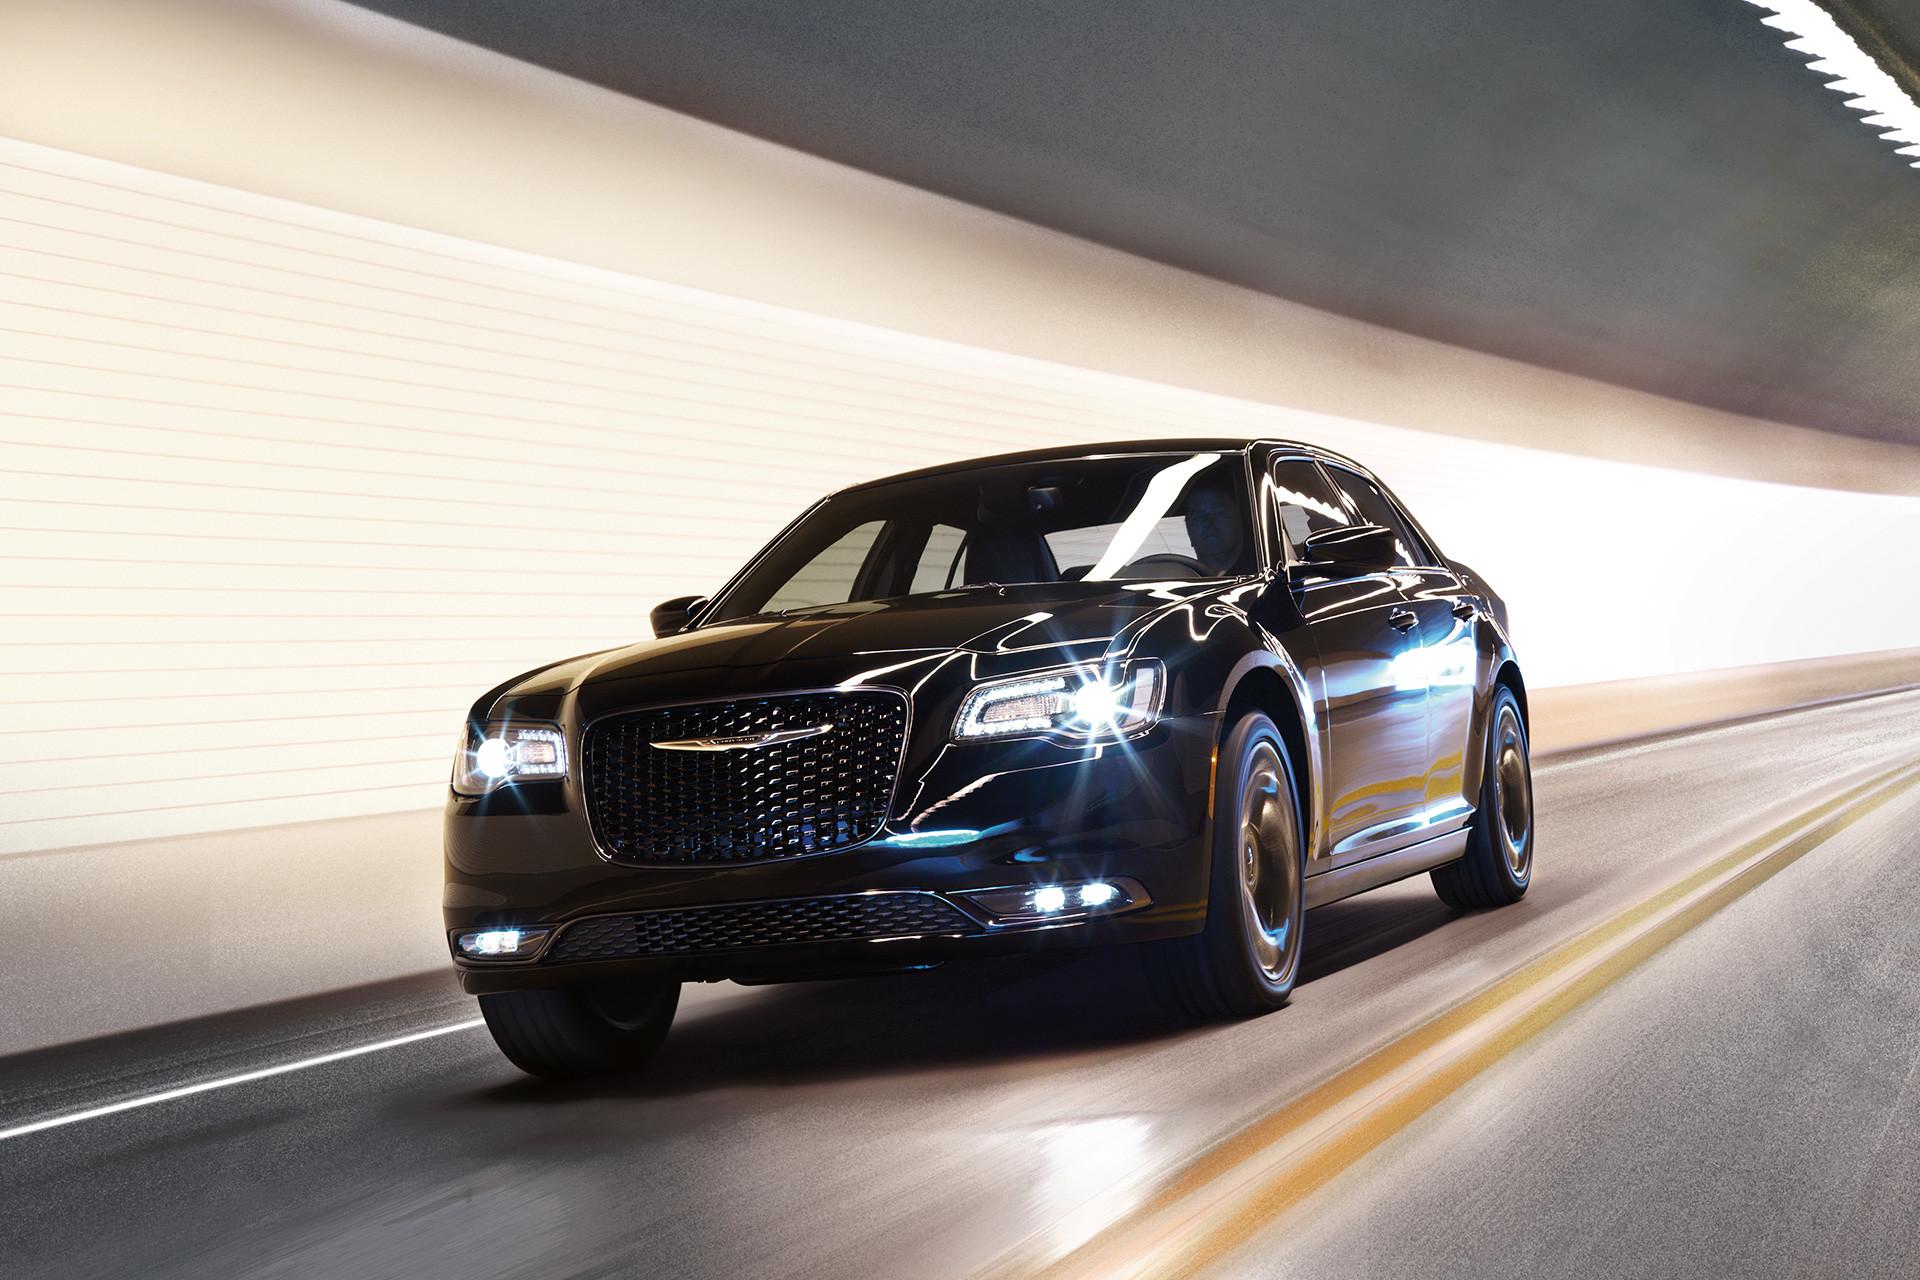 The black 2020 Chrysler 300 driving through a tunnel